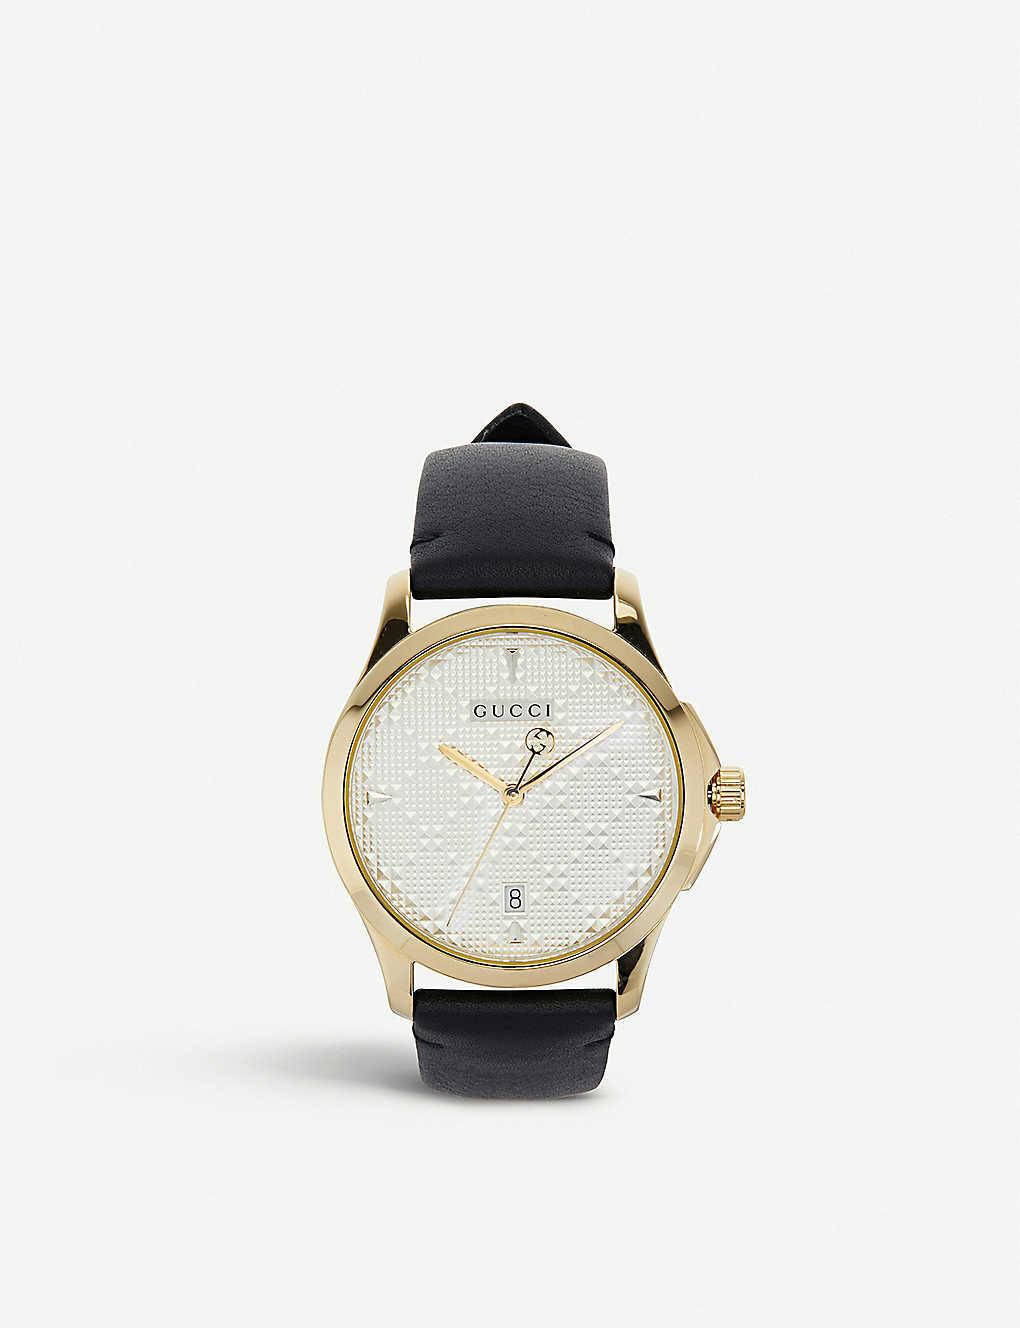 7a7fbdb9e2c GUCCI - YA1264027 G-Timeless gold-toned watch